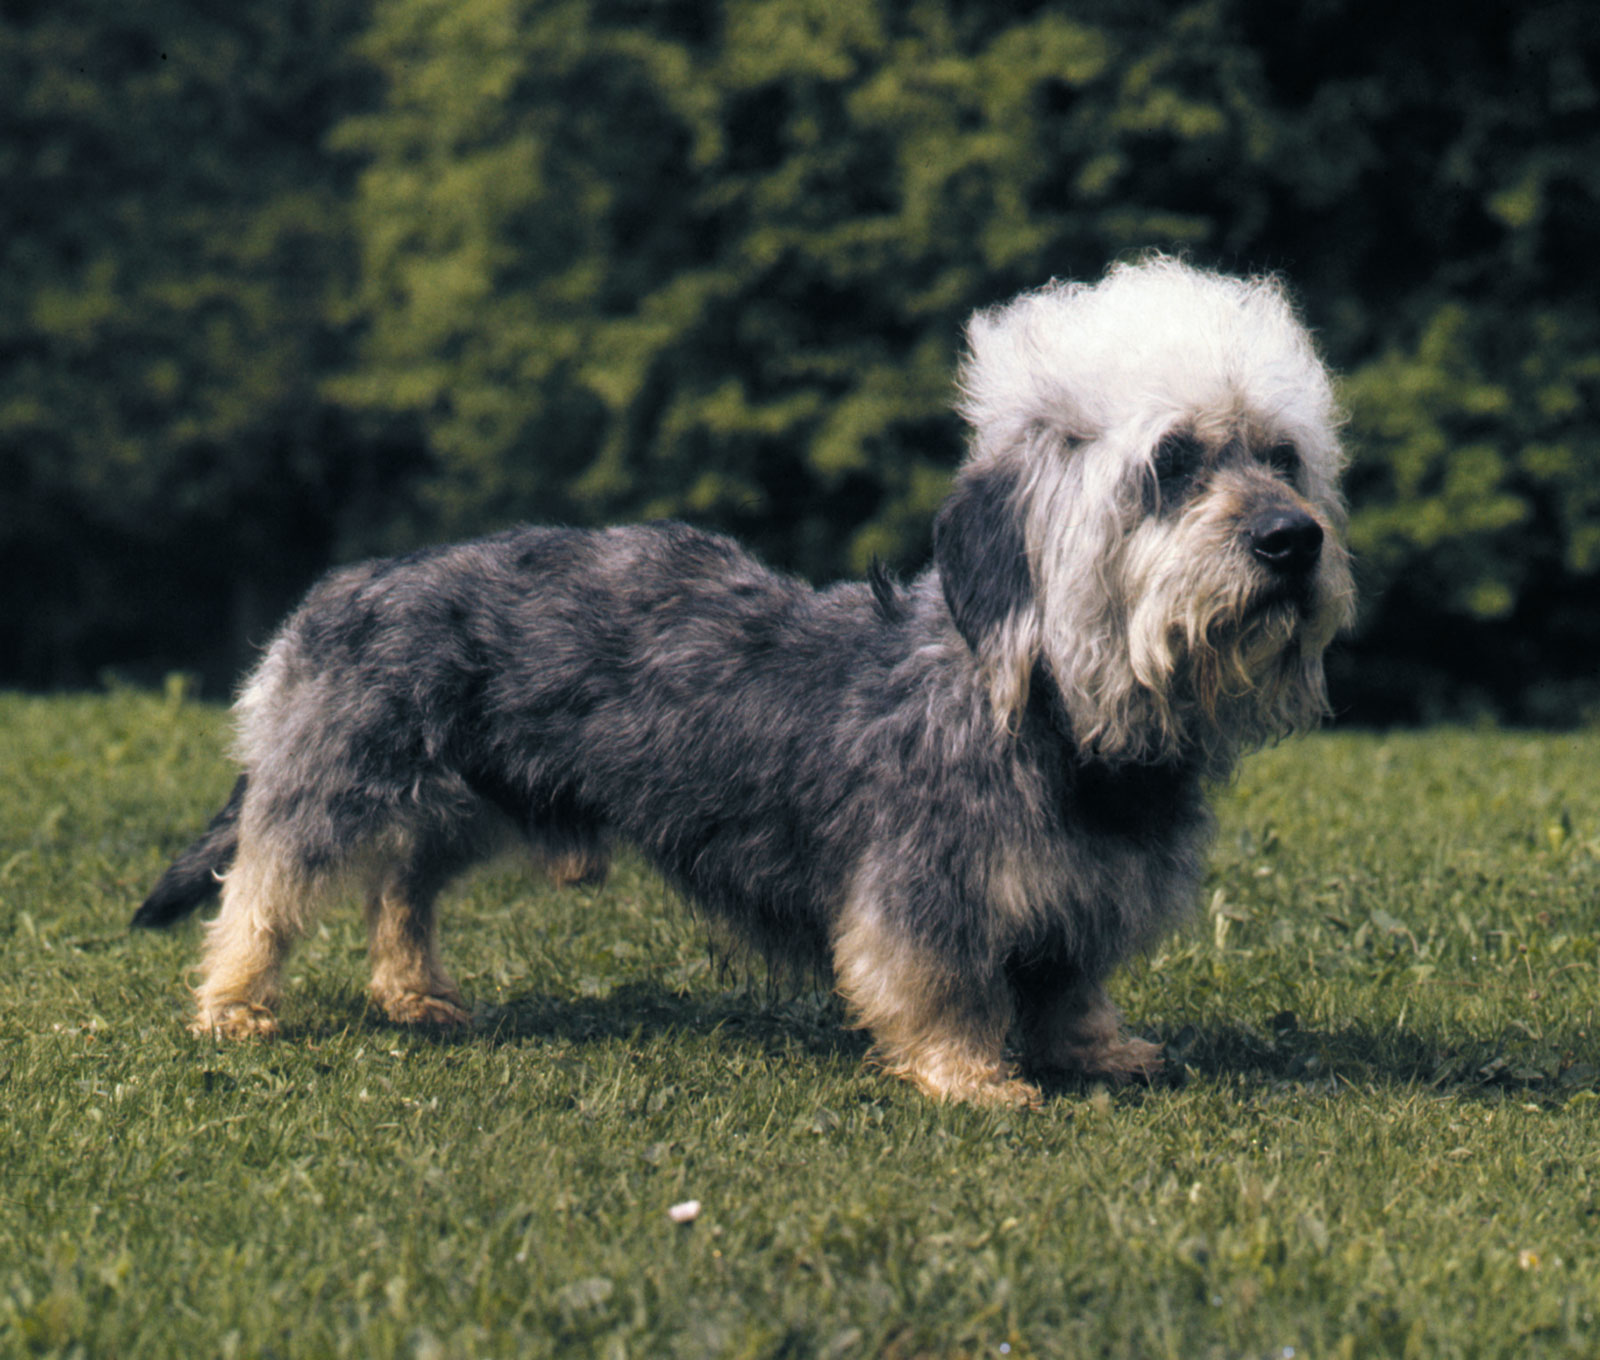 Dogilike.com :: Dandie Dinmont Terrier สุนัขพันธุ์หายากจากเกาะอังกฤษ